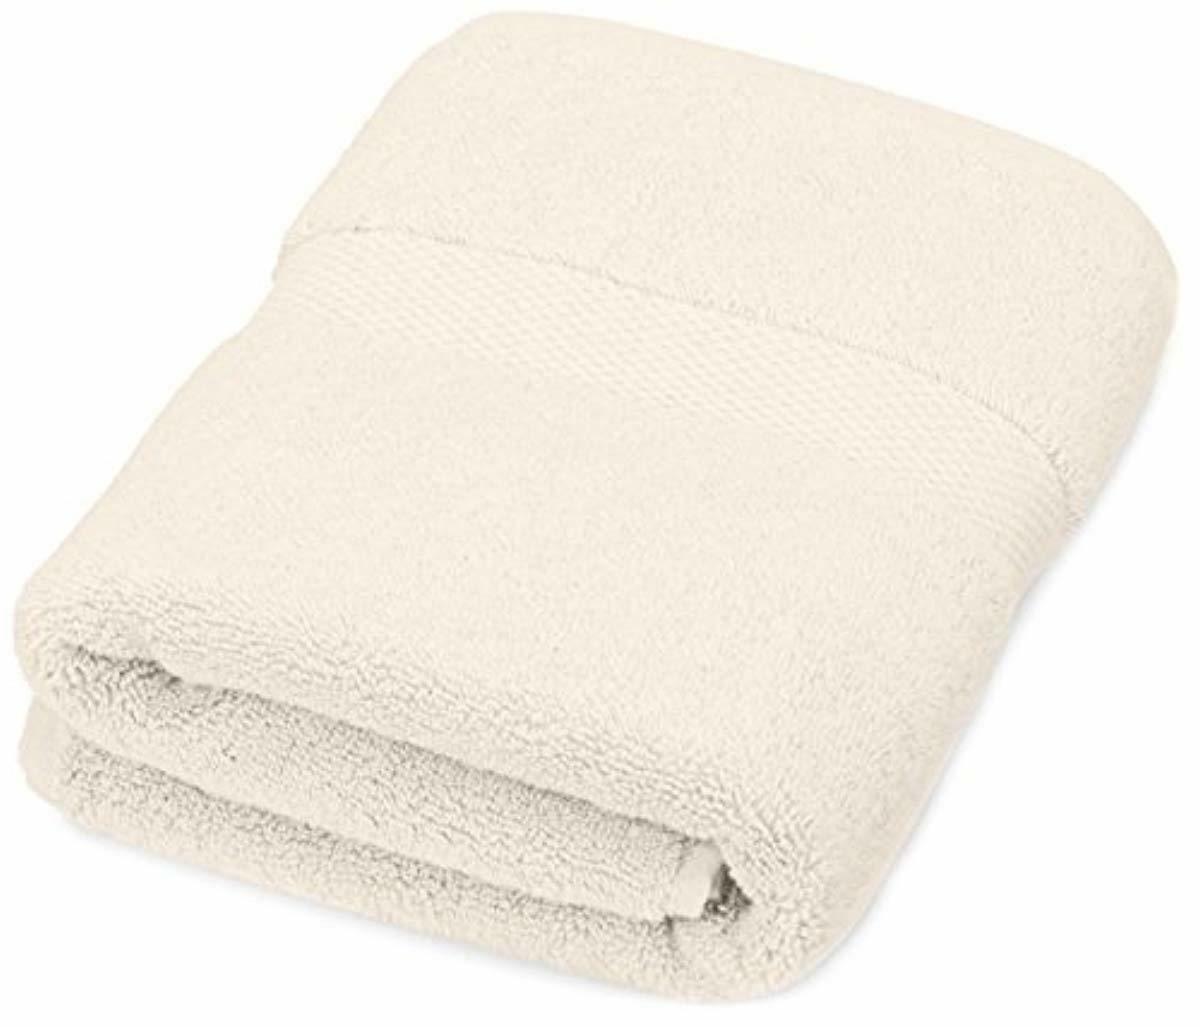 pinzon luxury 820 gram cotton hand towel